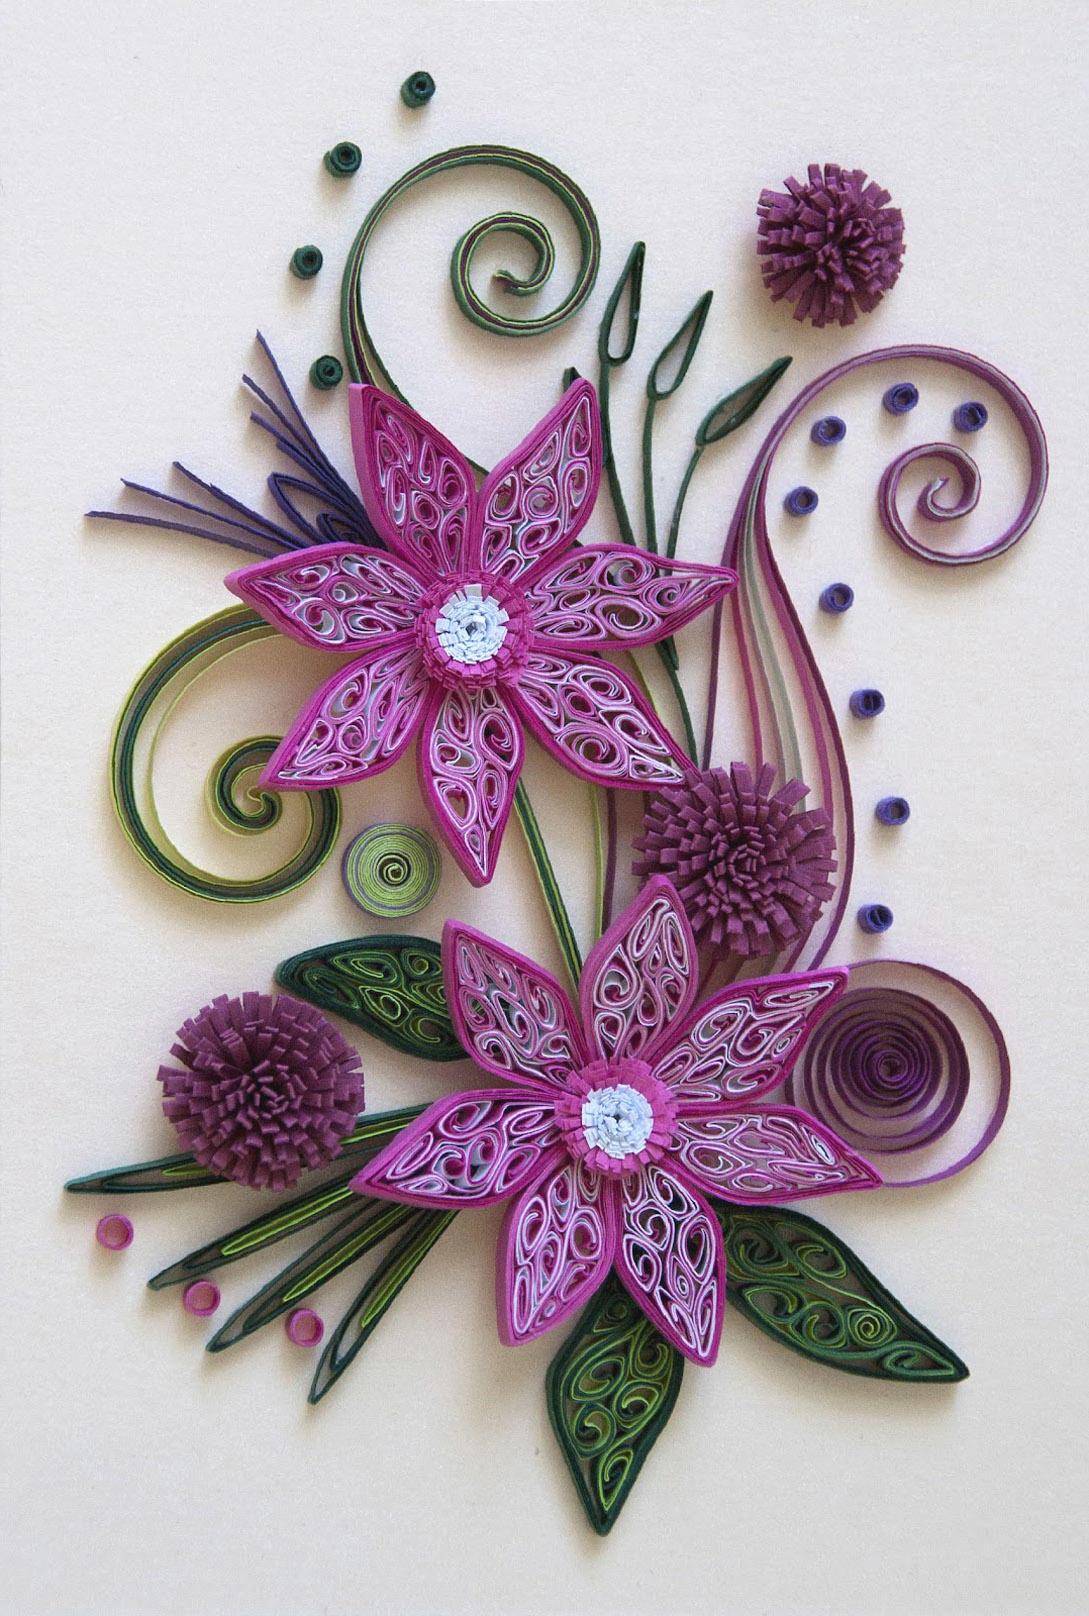 Цветы на открытки квиллинг, открытки рамки